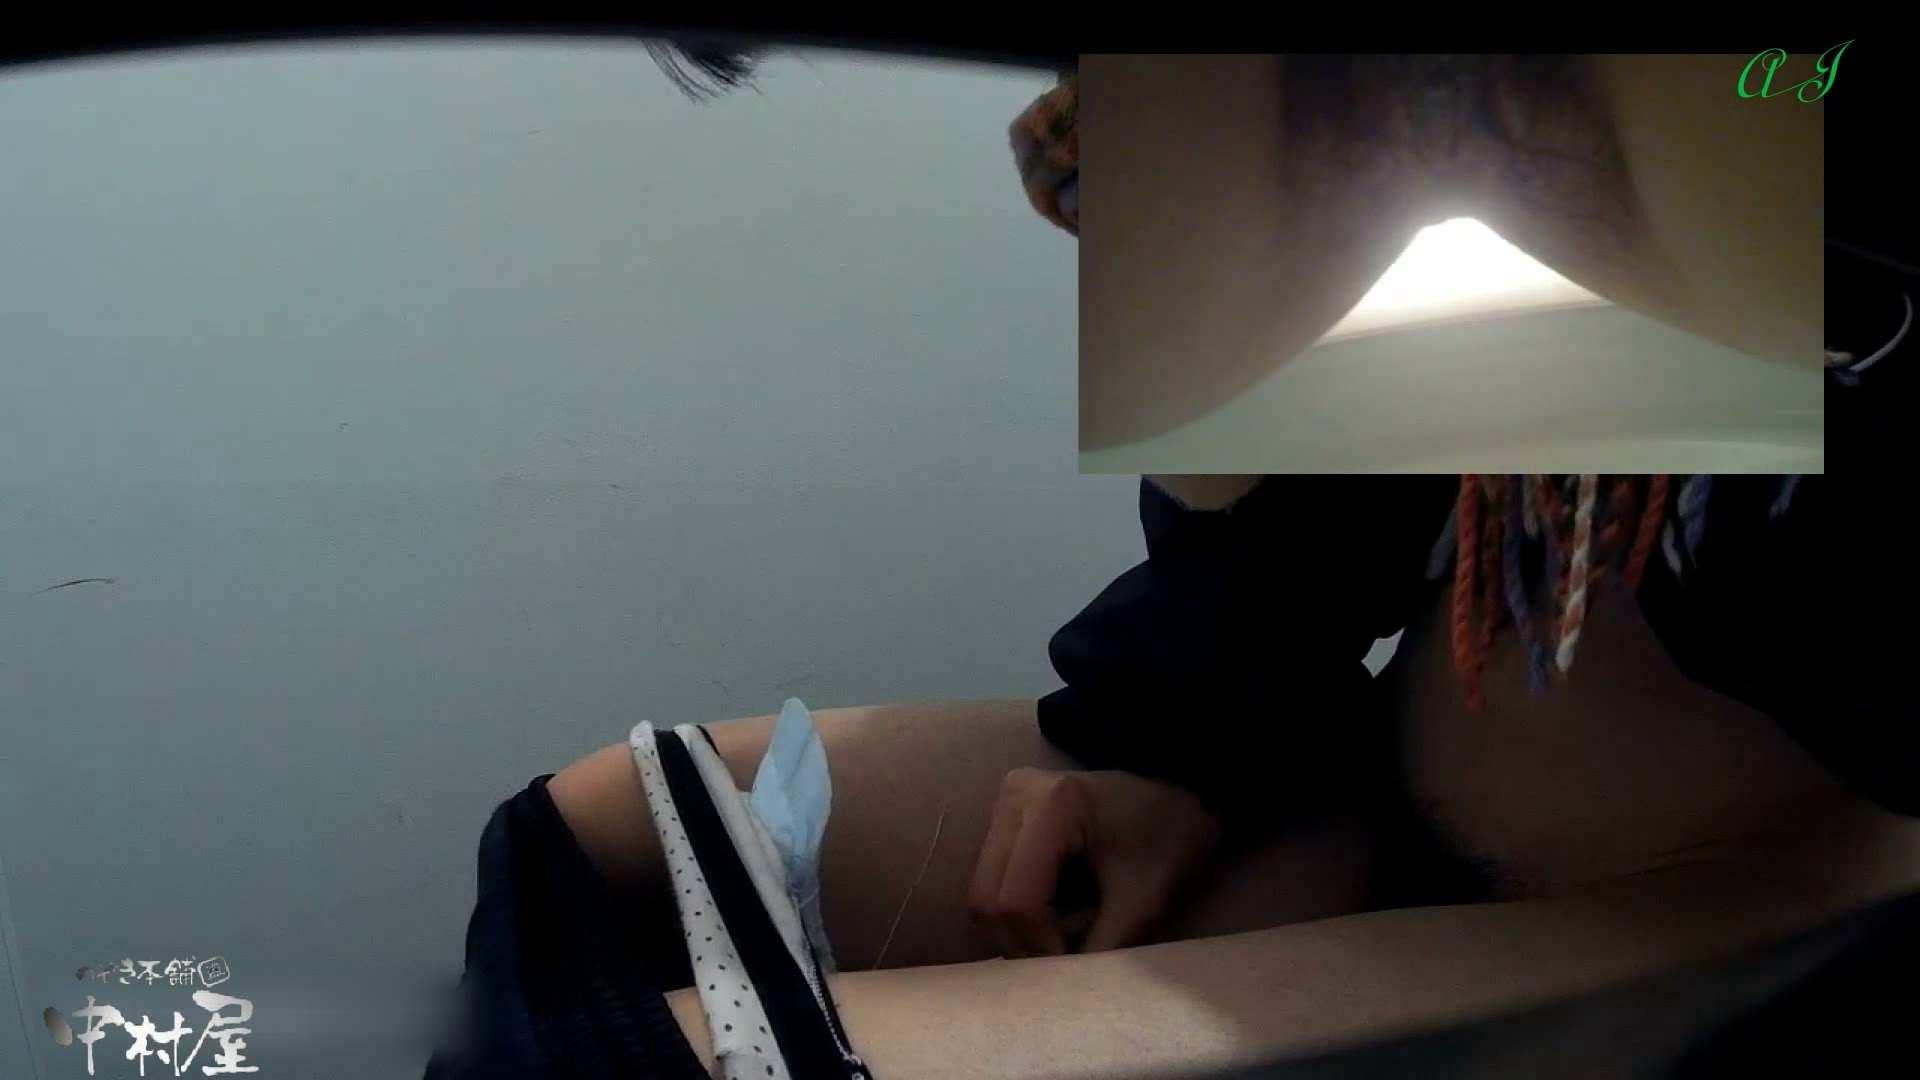 大あり美JDトイレ盗satu【有名大学女性洗面所 vol.80】 洗面所  67連発 30